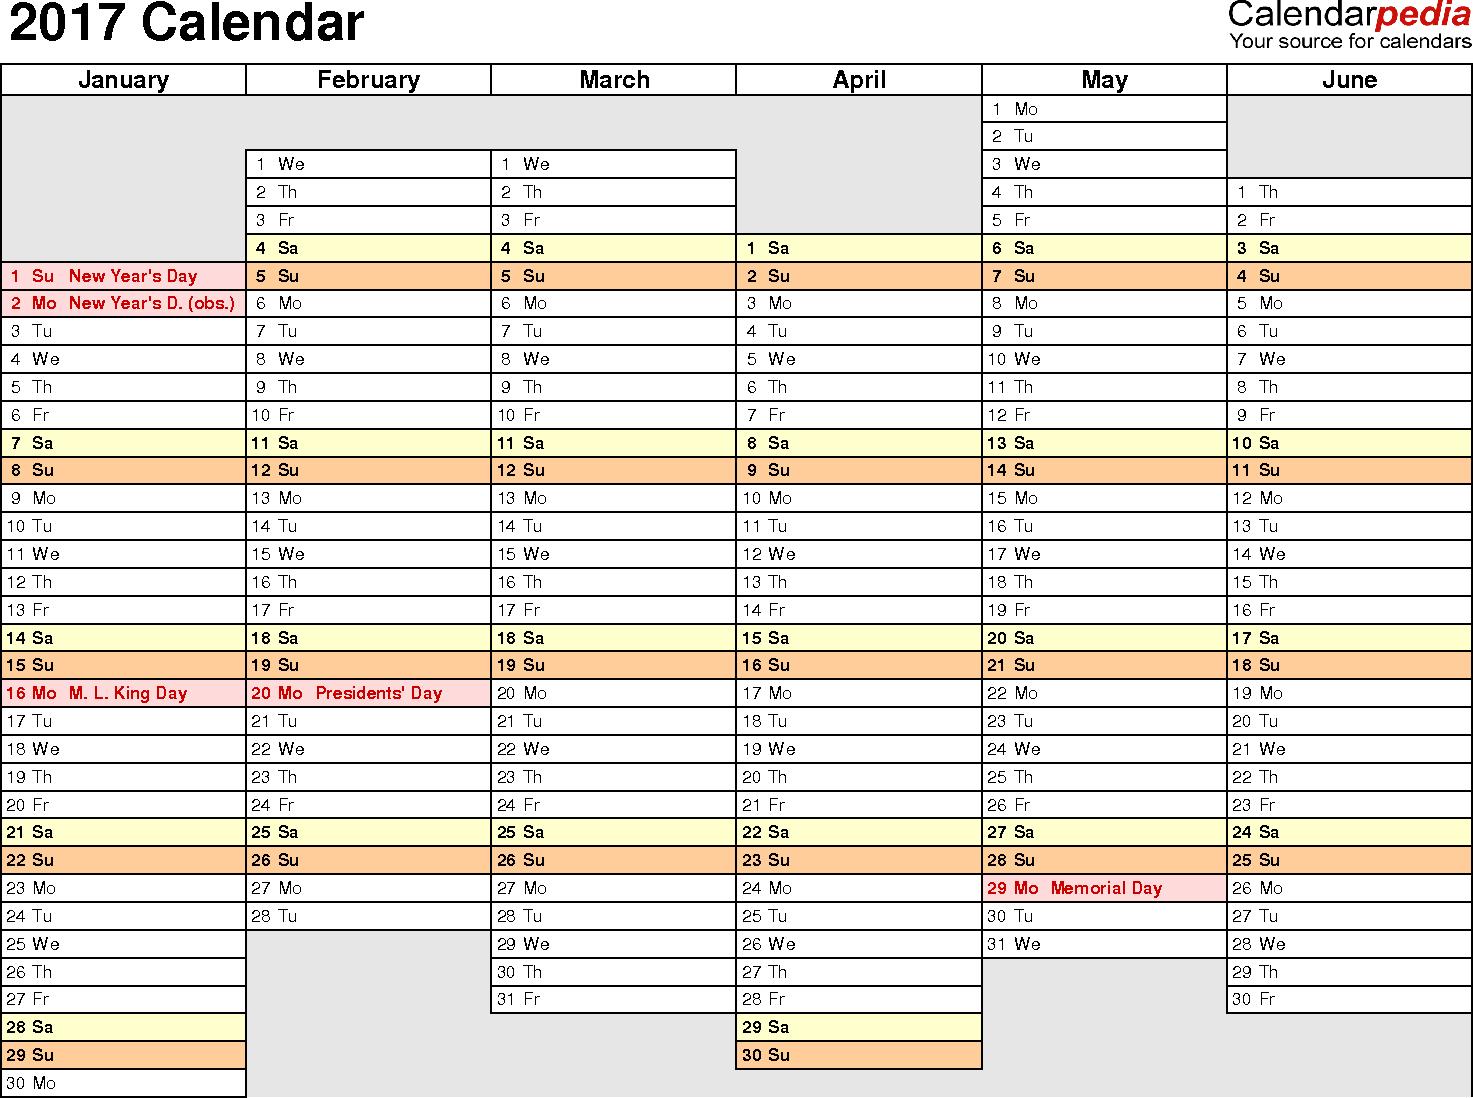 2017 Calendar Download 17 free printable Excel templates (.xls)